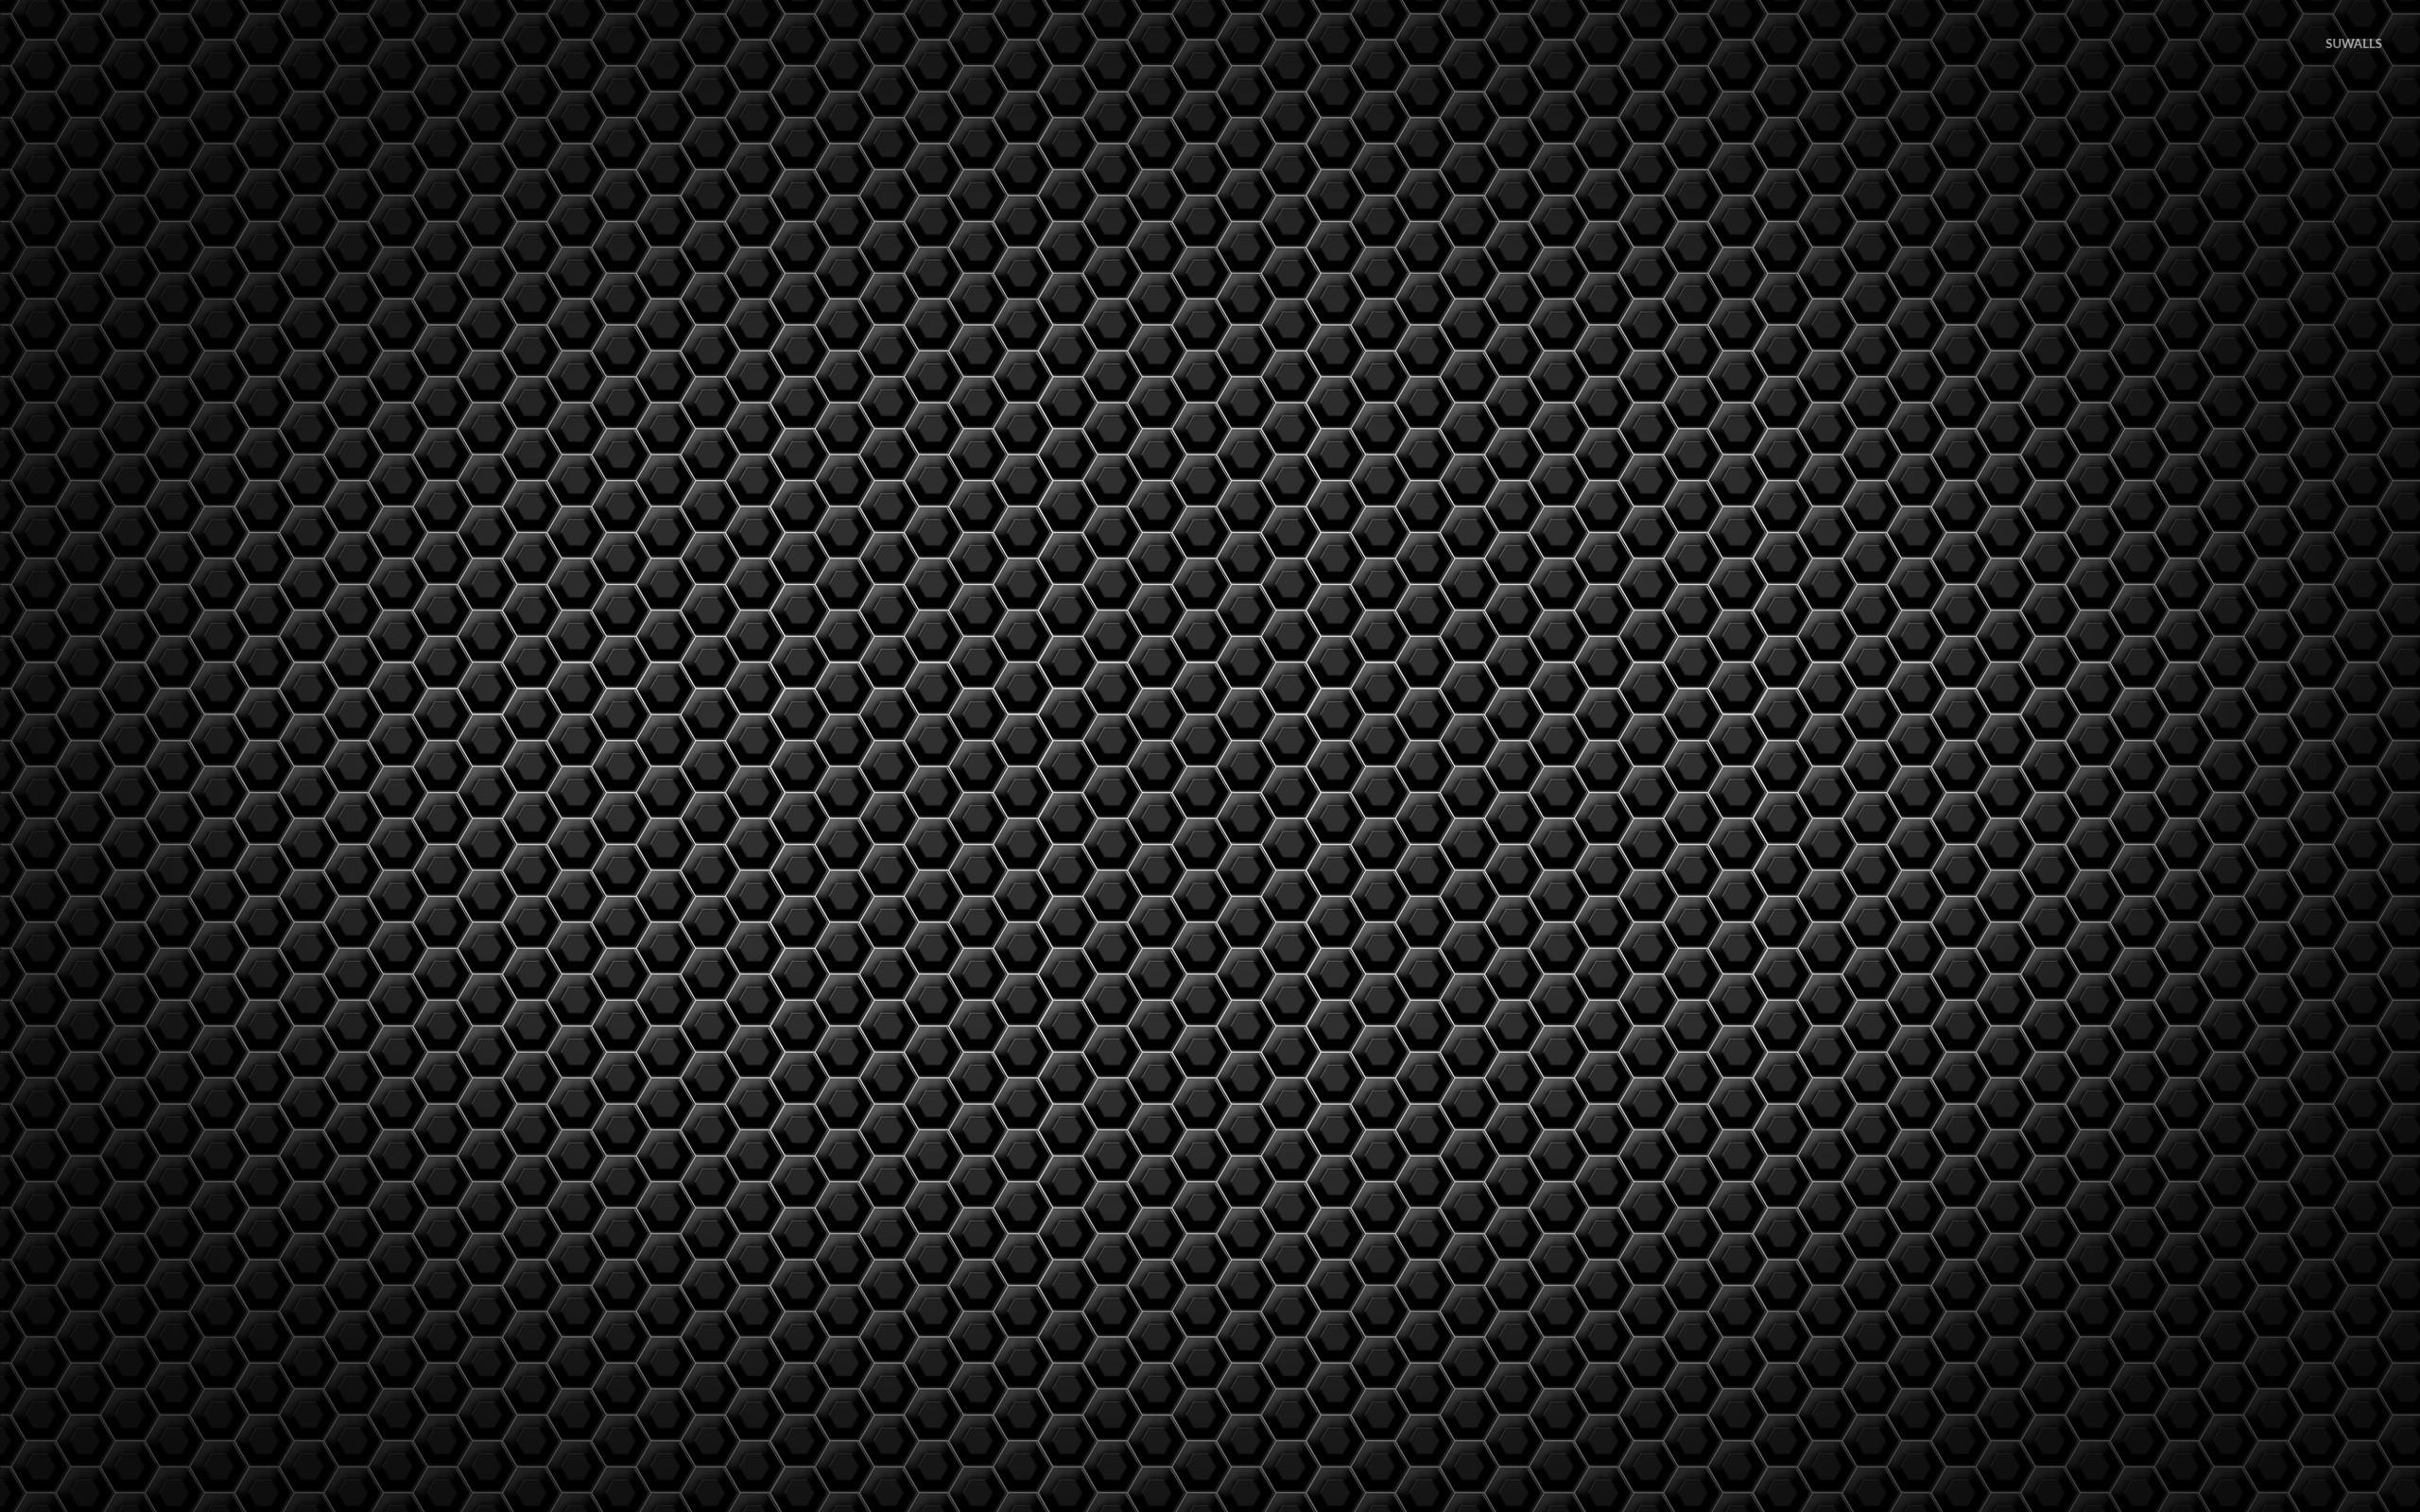 Metallic honeycomb pattern wallpaper abstract wallpapers for Metallic wallpaper